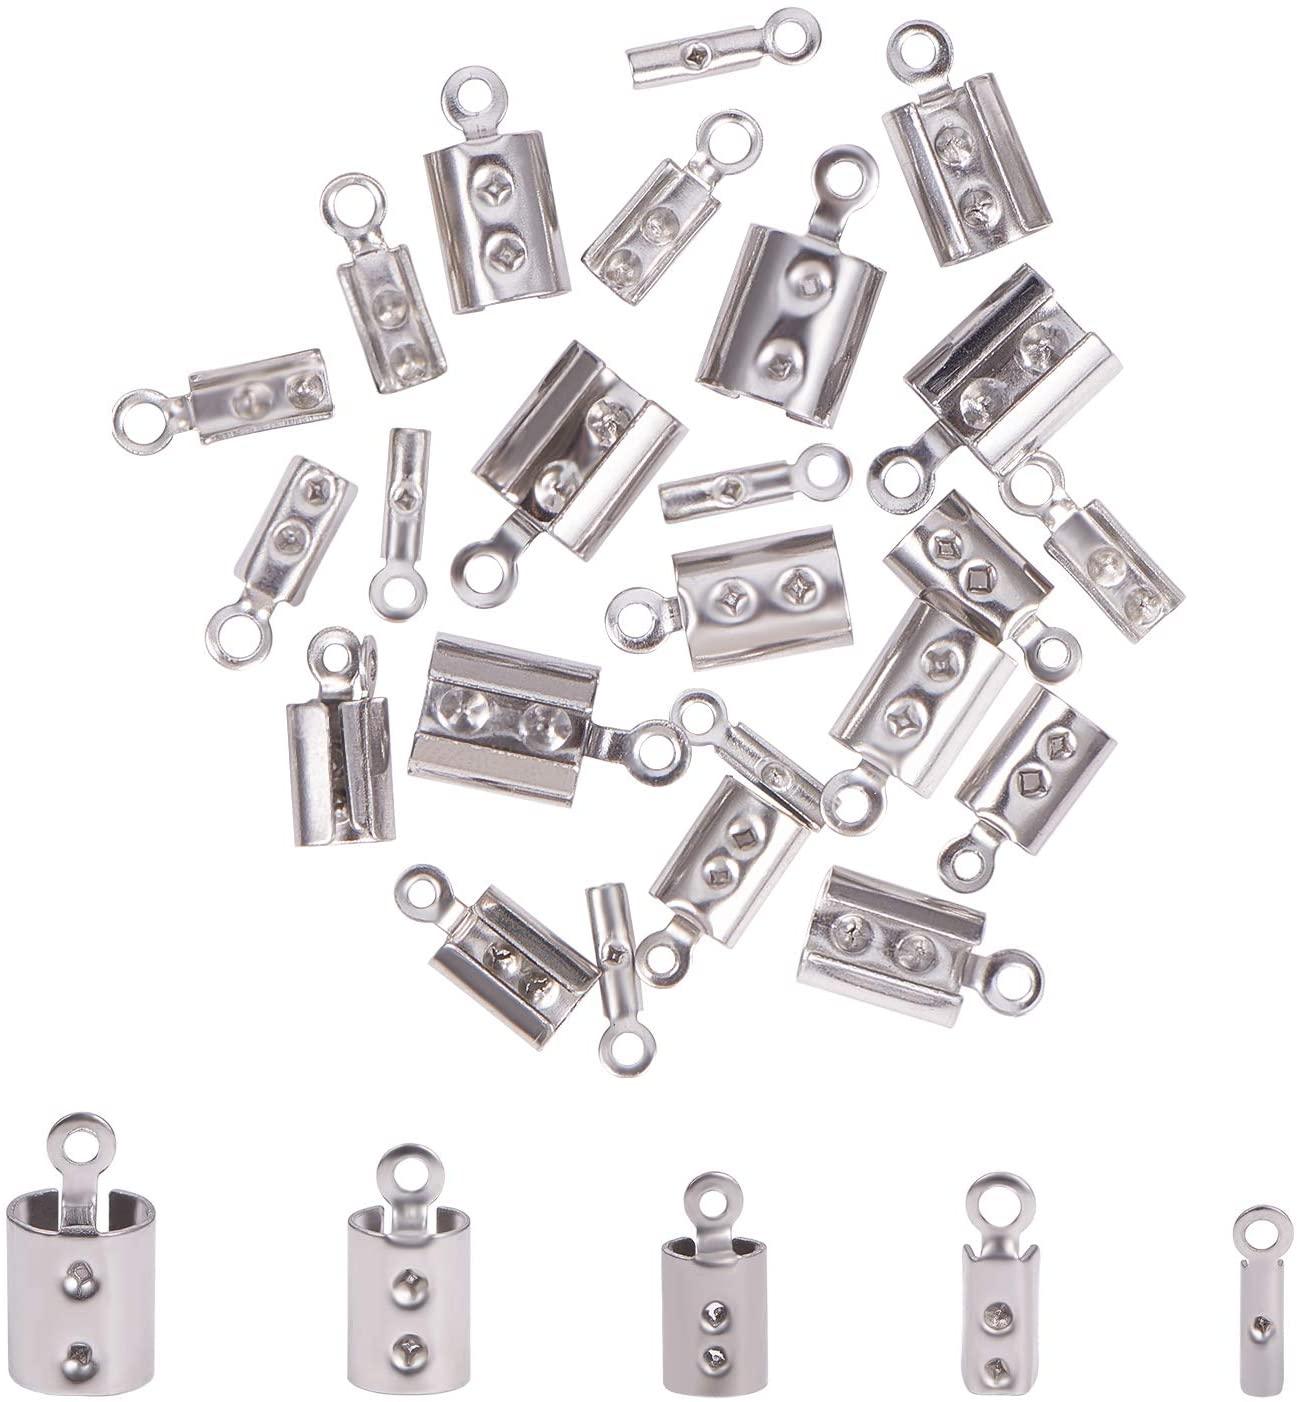 UNICRAFTALE 5 Sizes Folding Crimp Ends 250pcs Crimps Ends Fold Over Cord Ends Terminators Clamp End Tips Jewelry Finding Kit for Bracelets